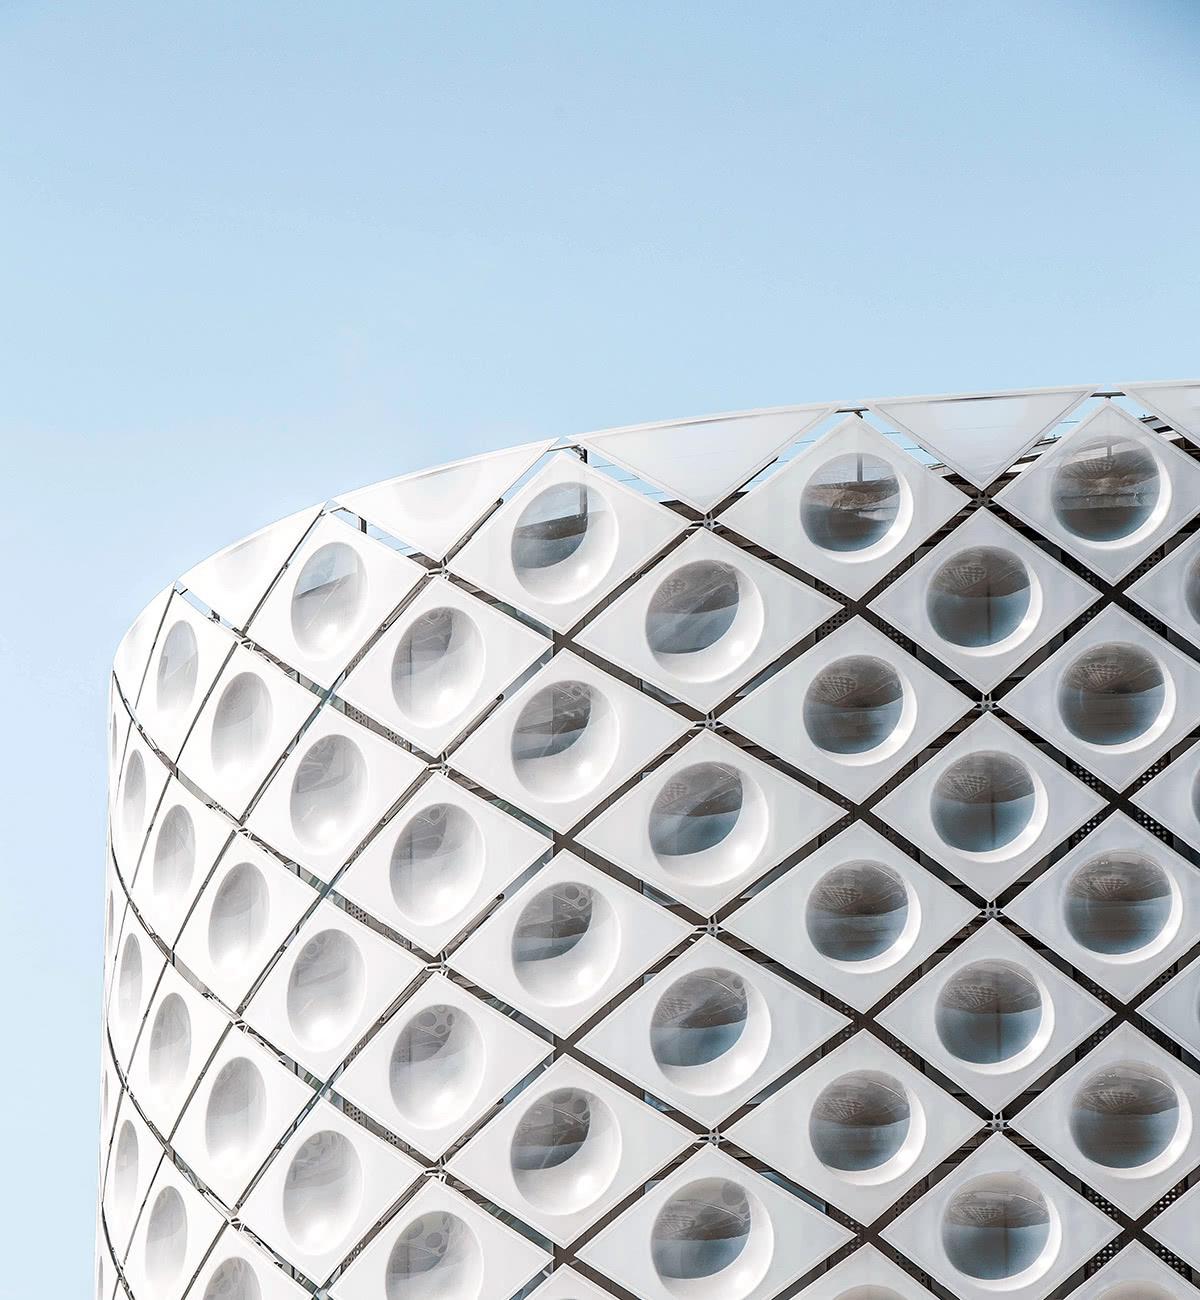 Luxe Digital luxury big data analytics business insights